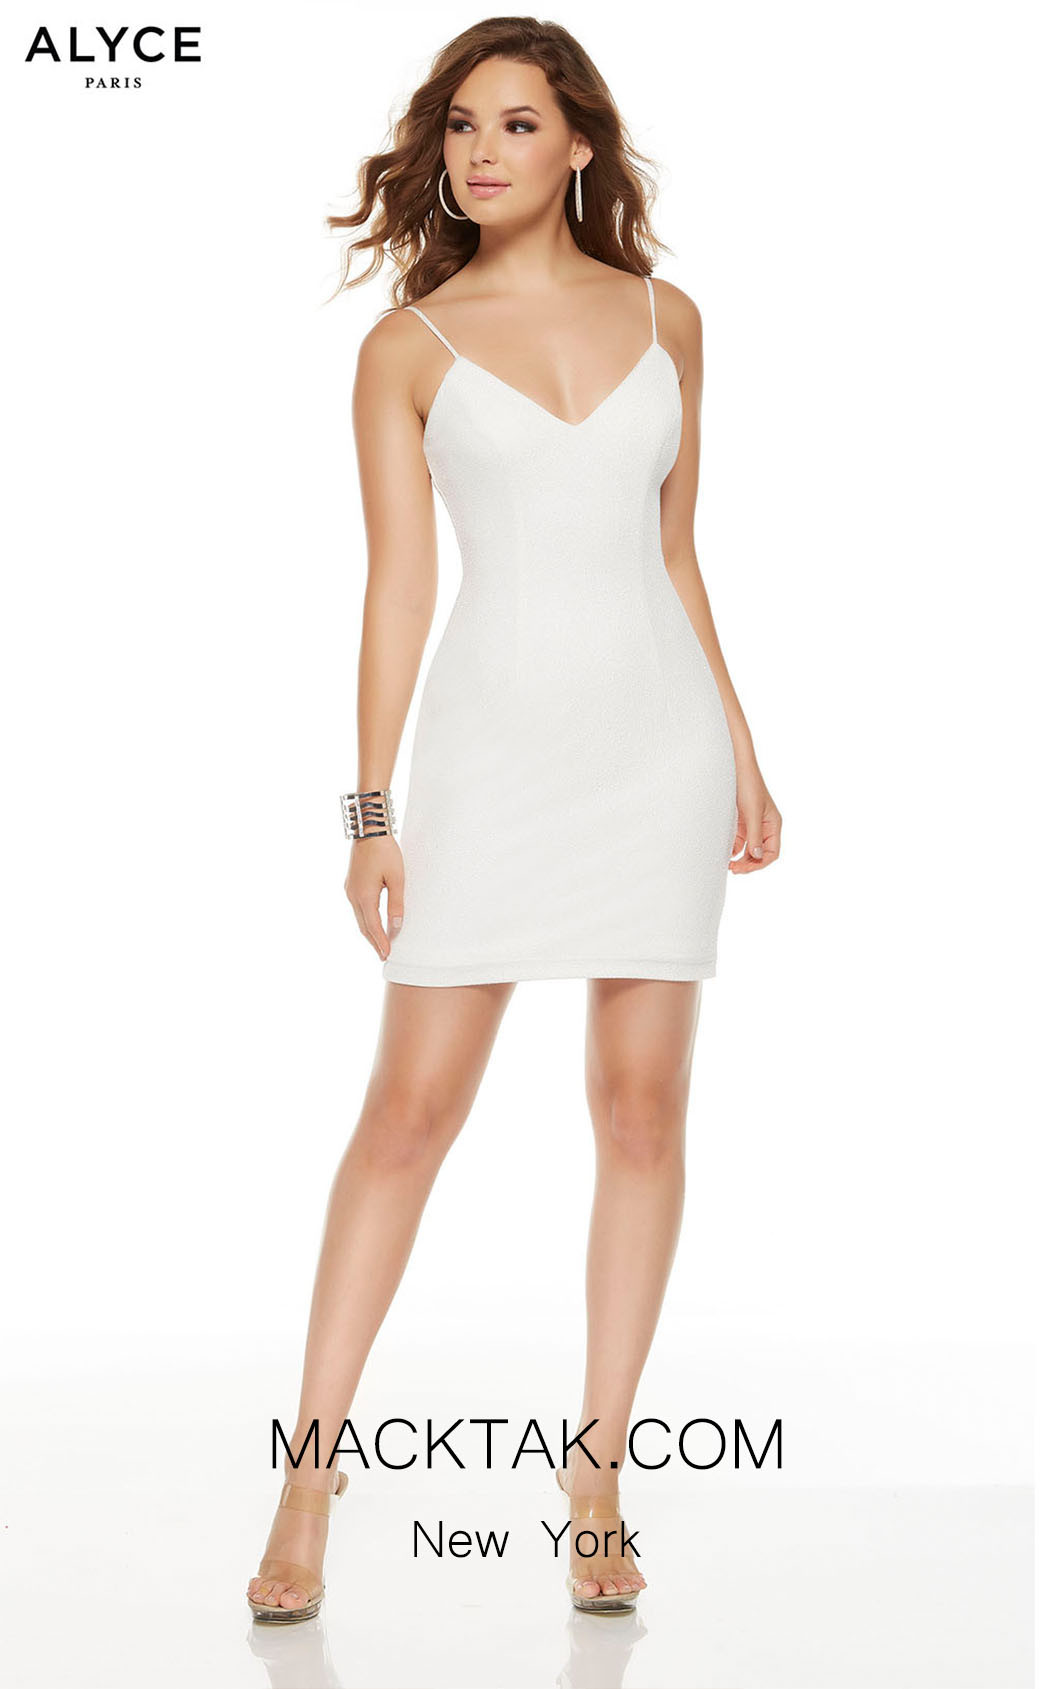 Alyce Paris 4224 Diamond White Front Dress